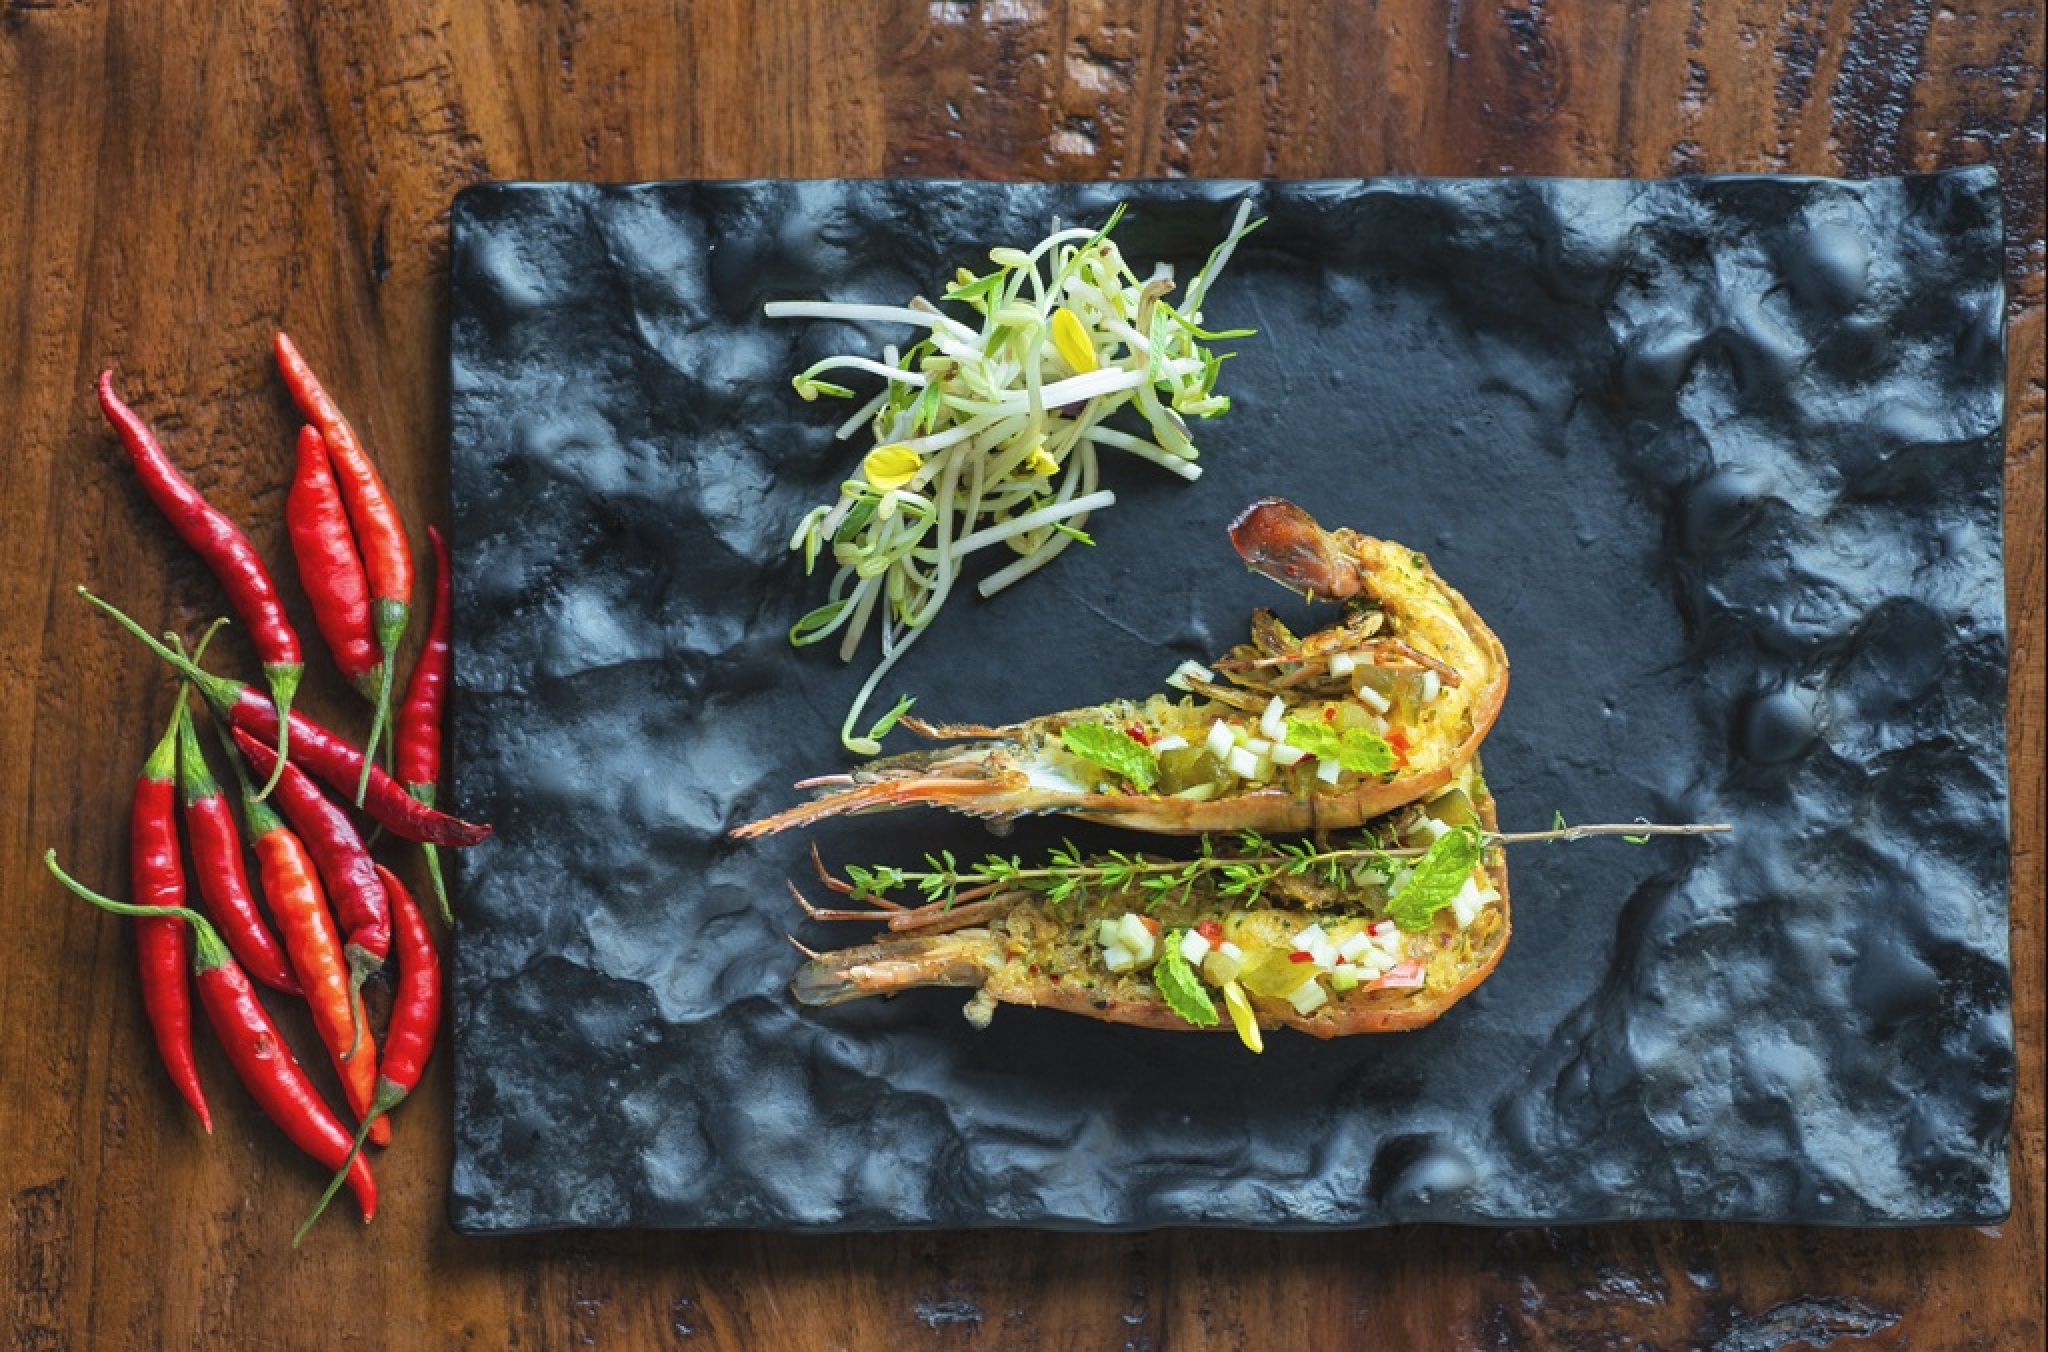 Recipes: Jimbaran style prawn and Laksa soup